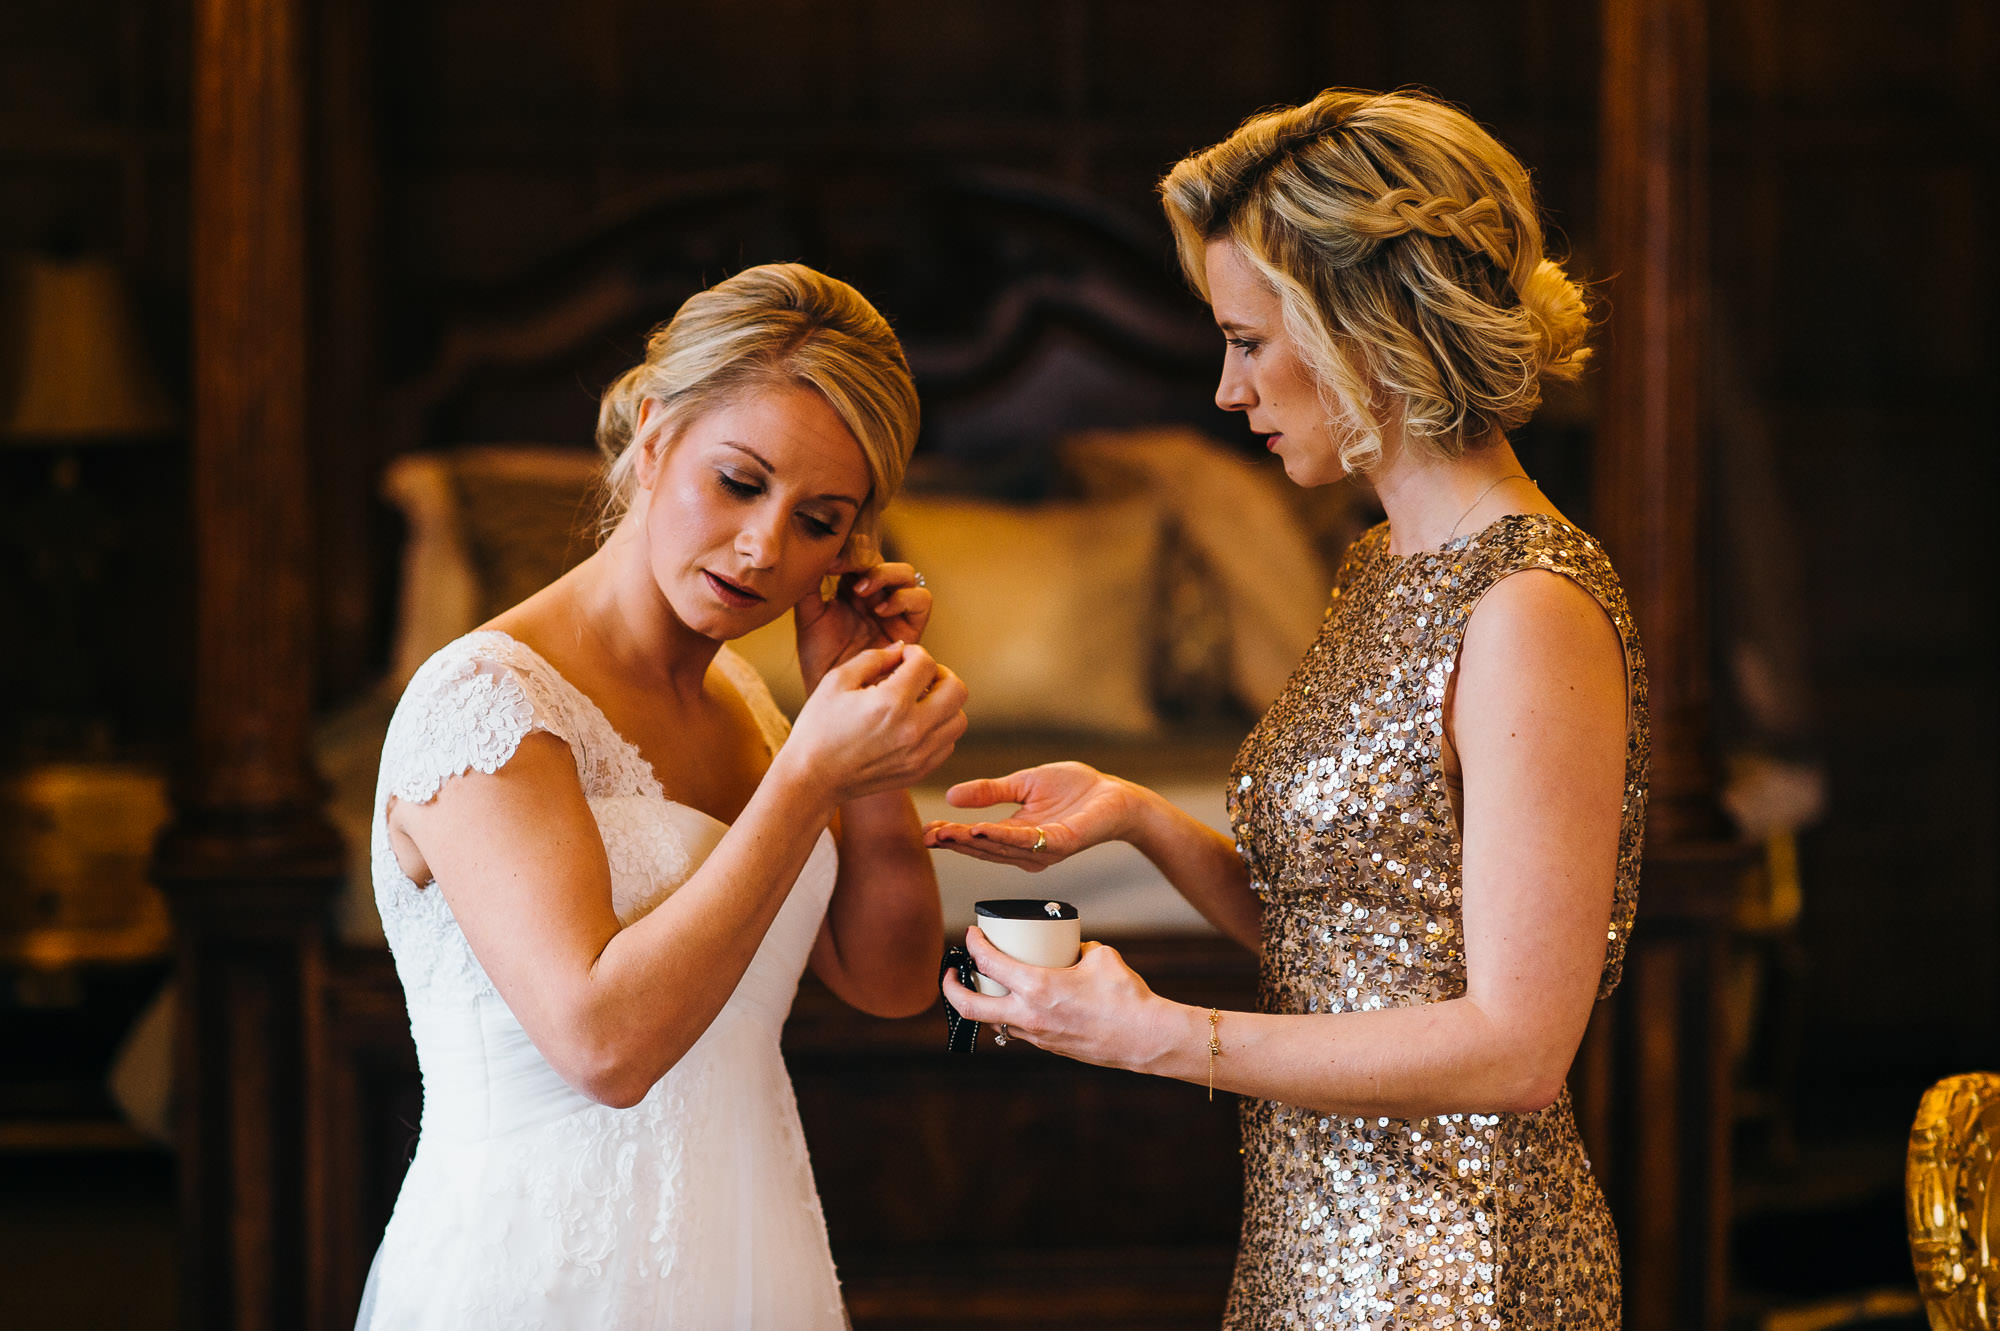 Bride at Hengrave hall winter wedding